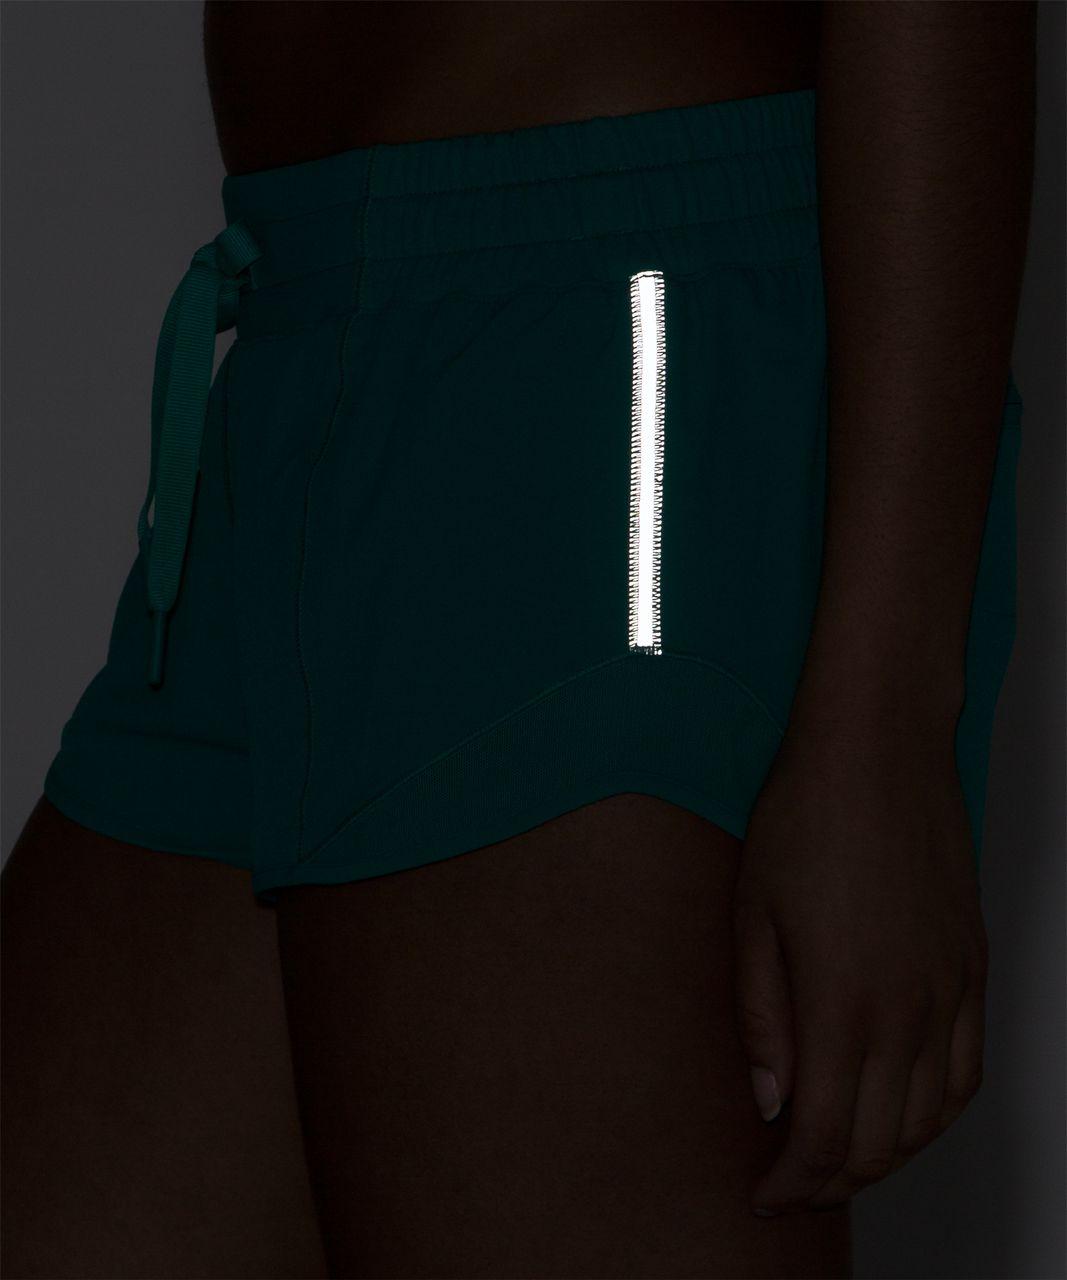 "Lululemon Hotty Hot Short (2 1/2"" ) - Viridian Green"